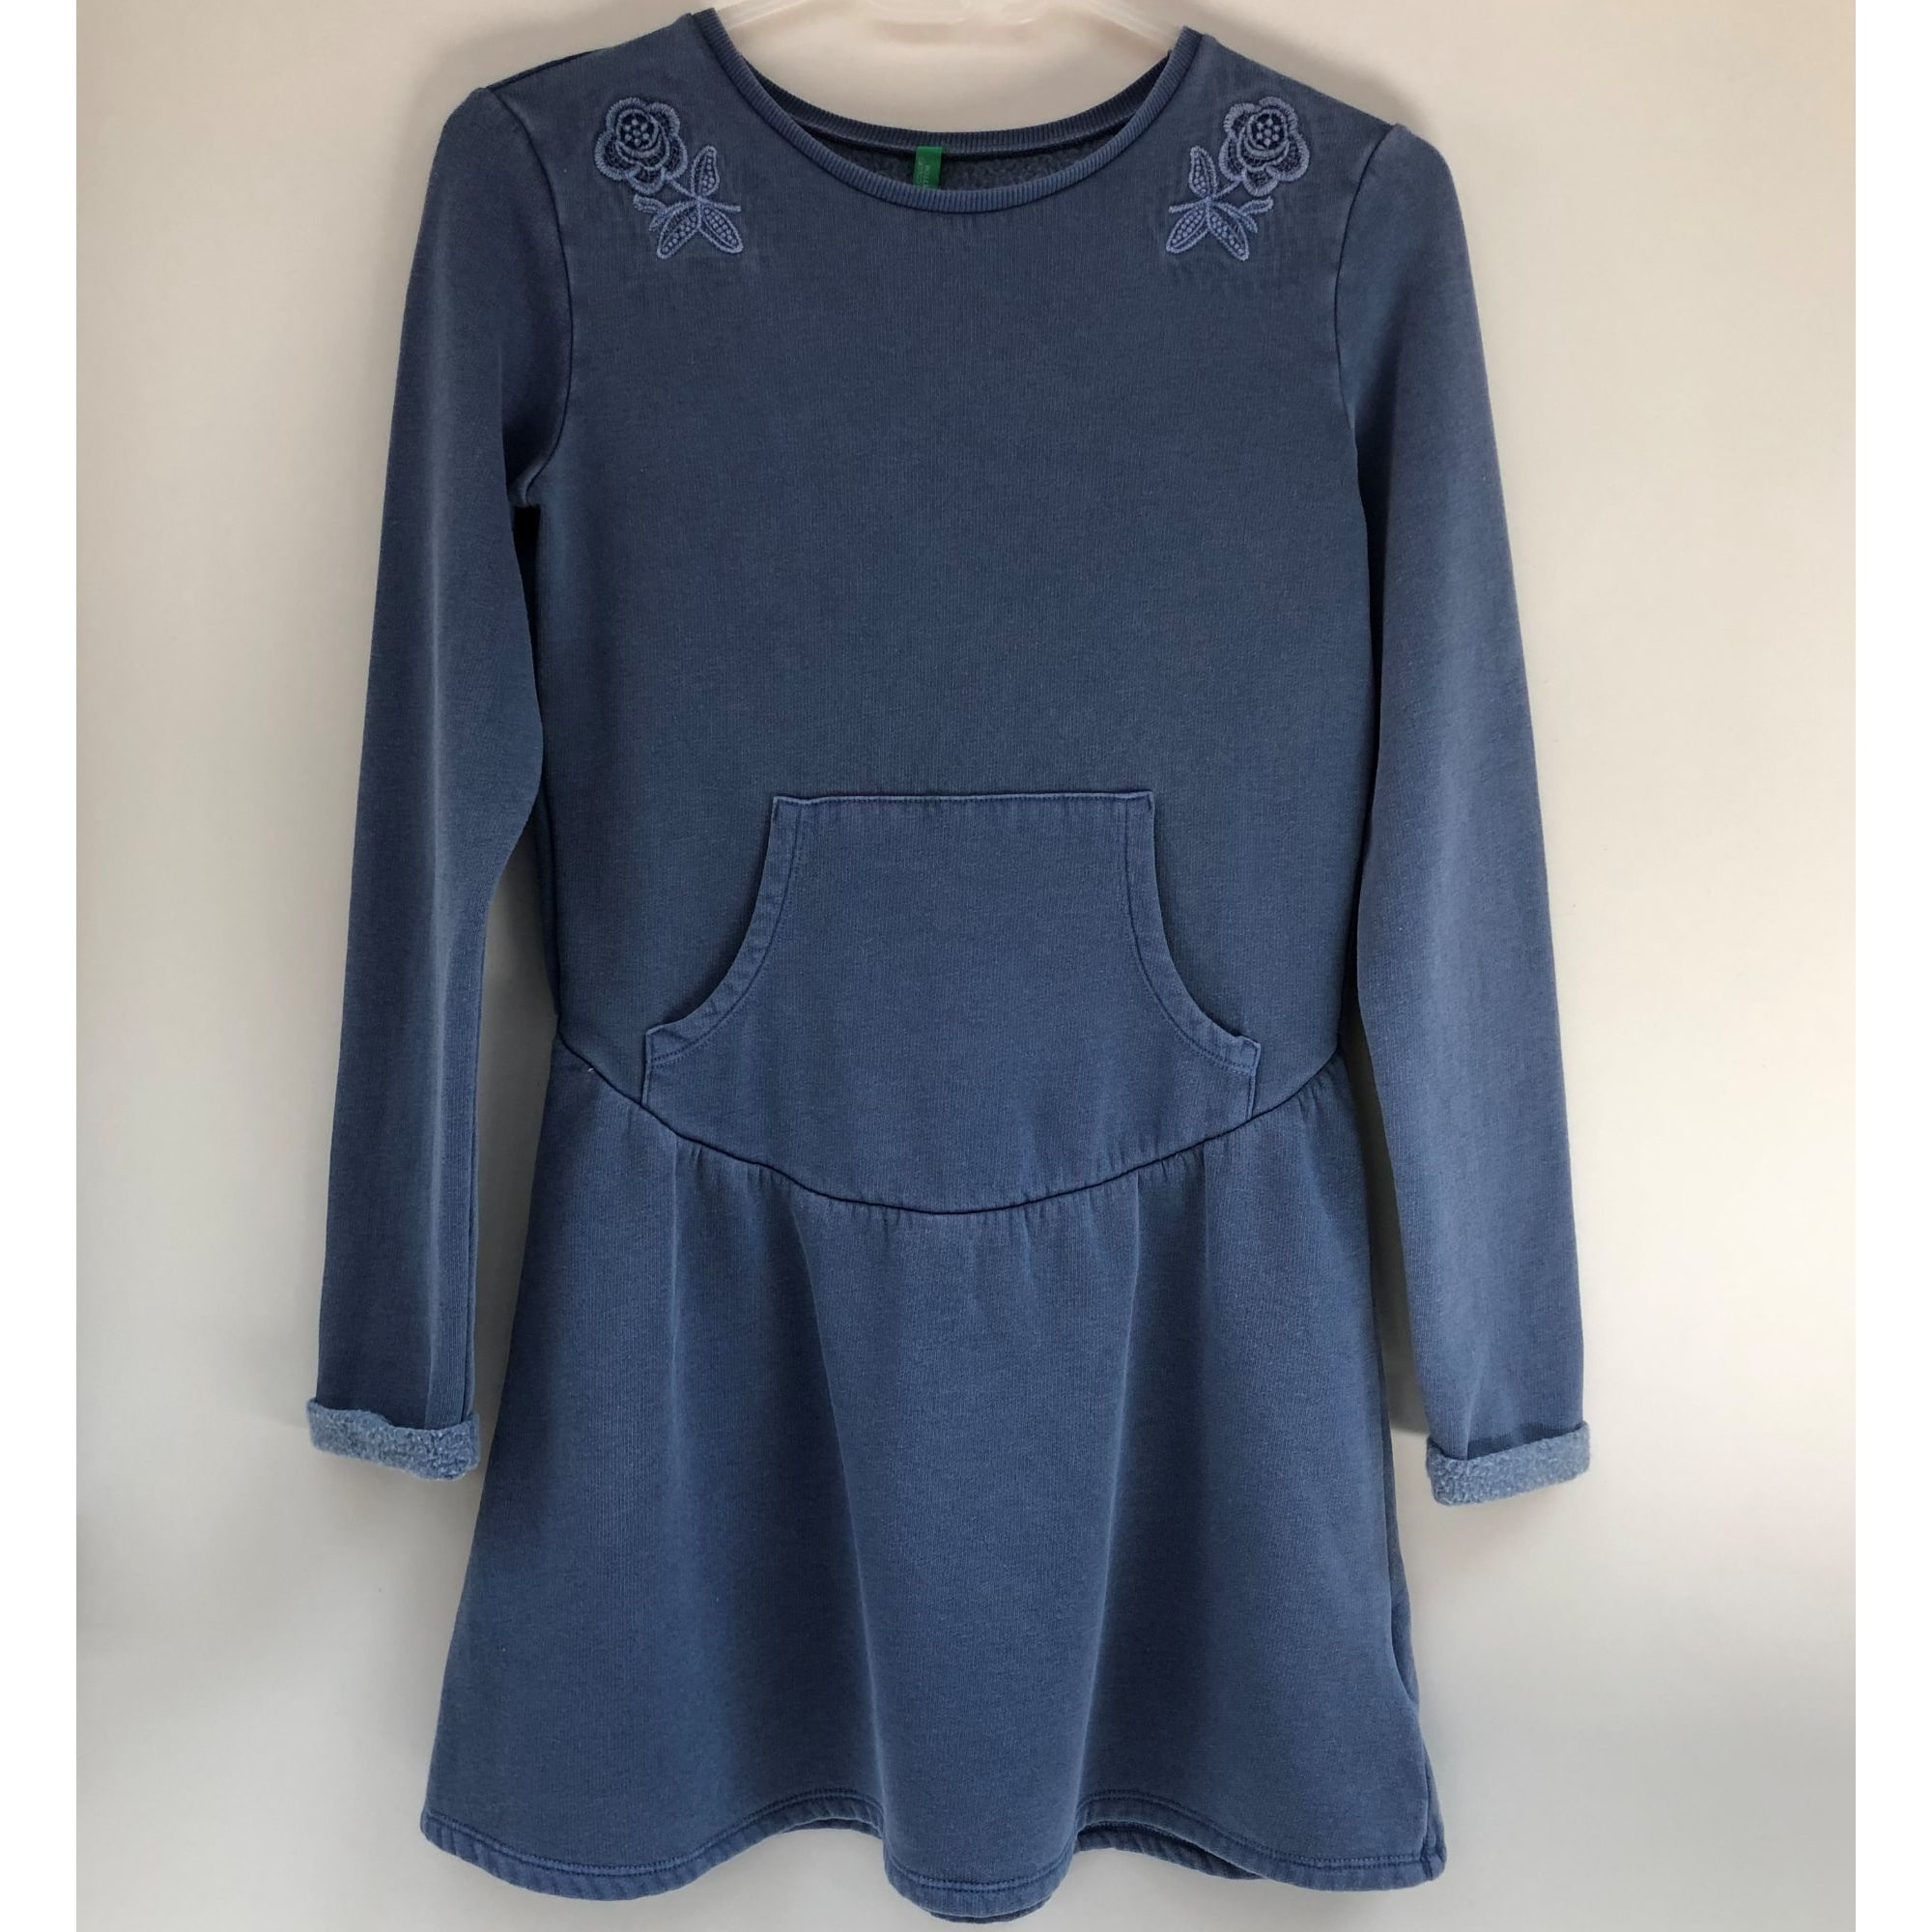 Robe UNITED COLORS OF BENETTON Bleu, bleu marine, bleu turquoise